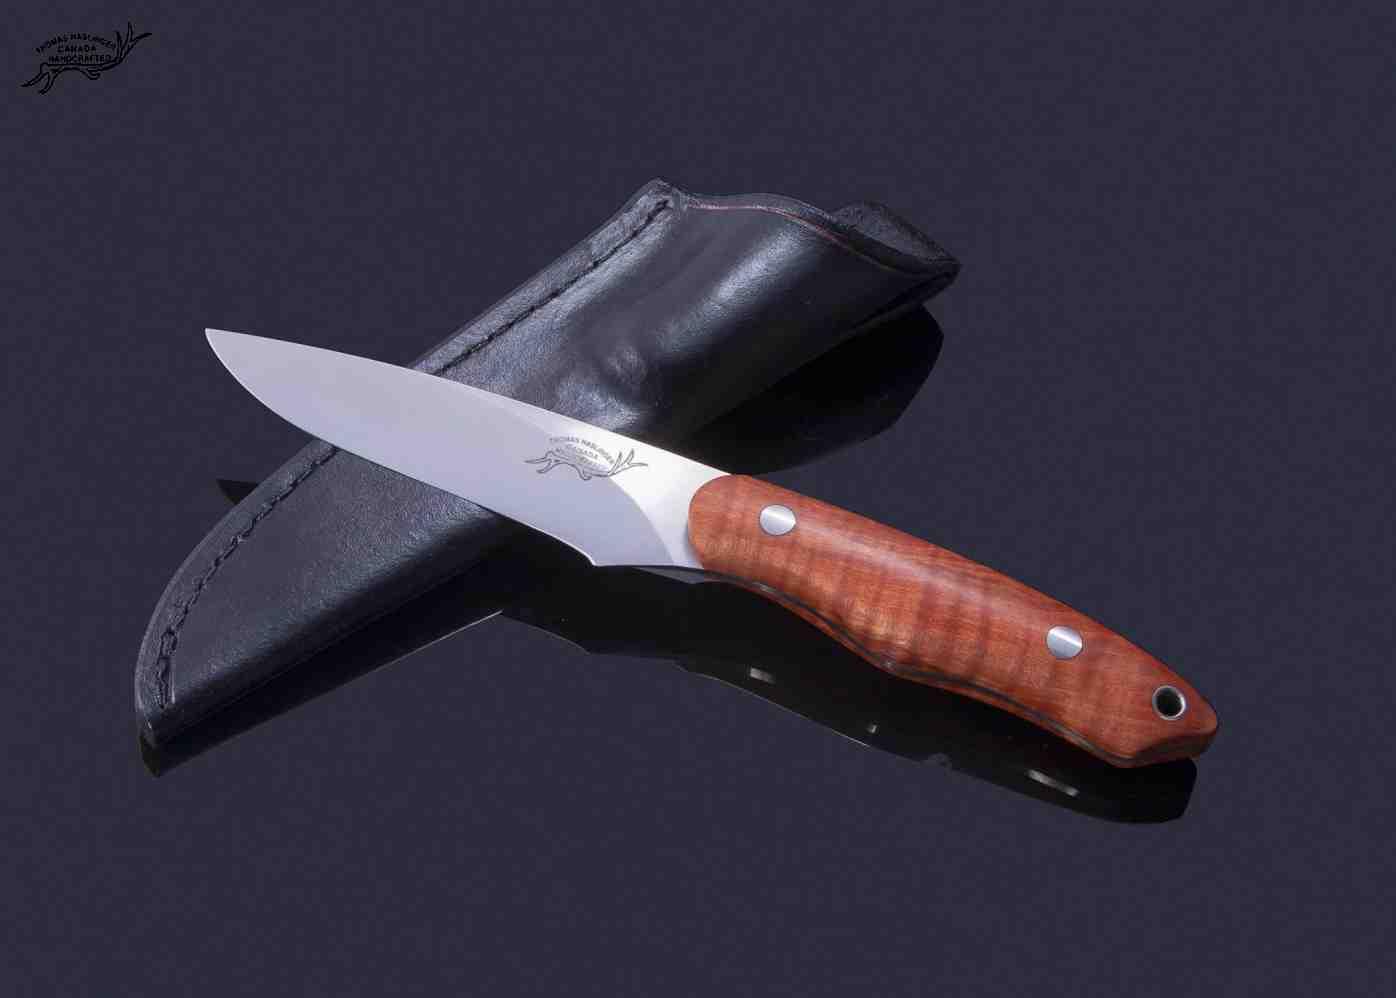 Fiddleback maple utility knife in cpm s vn stainless